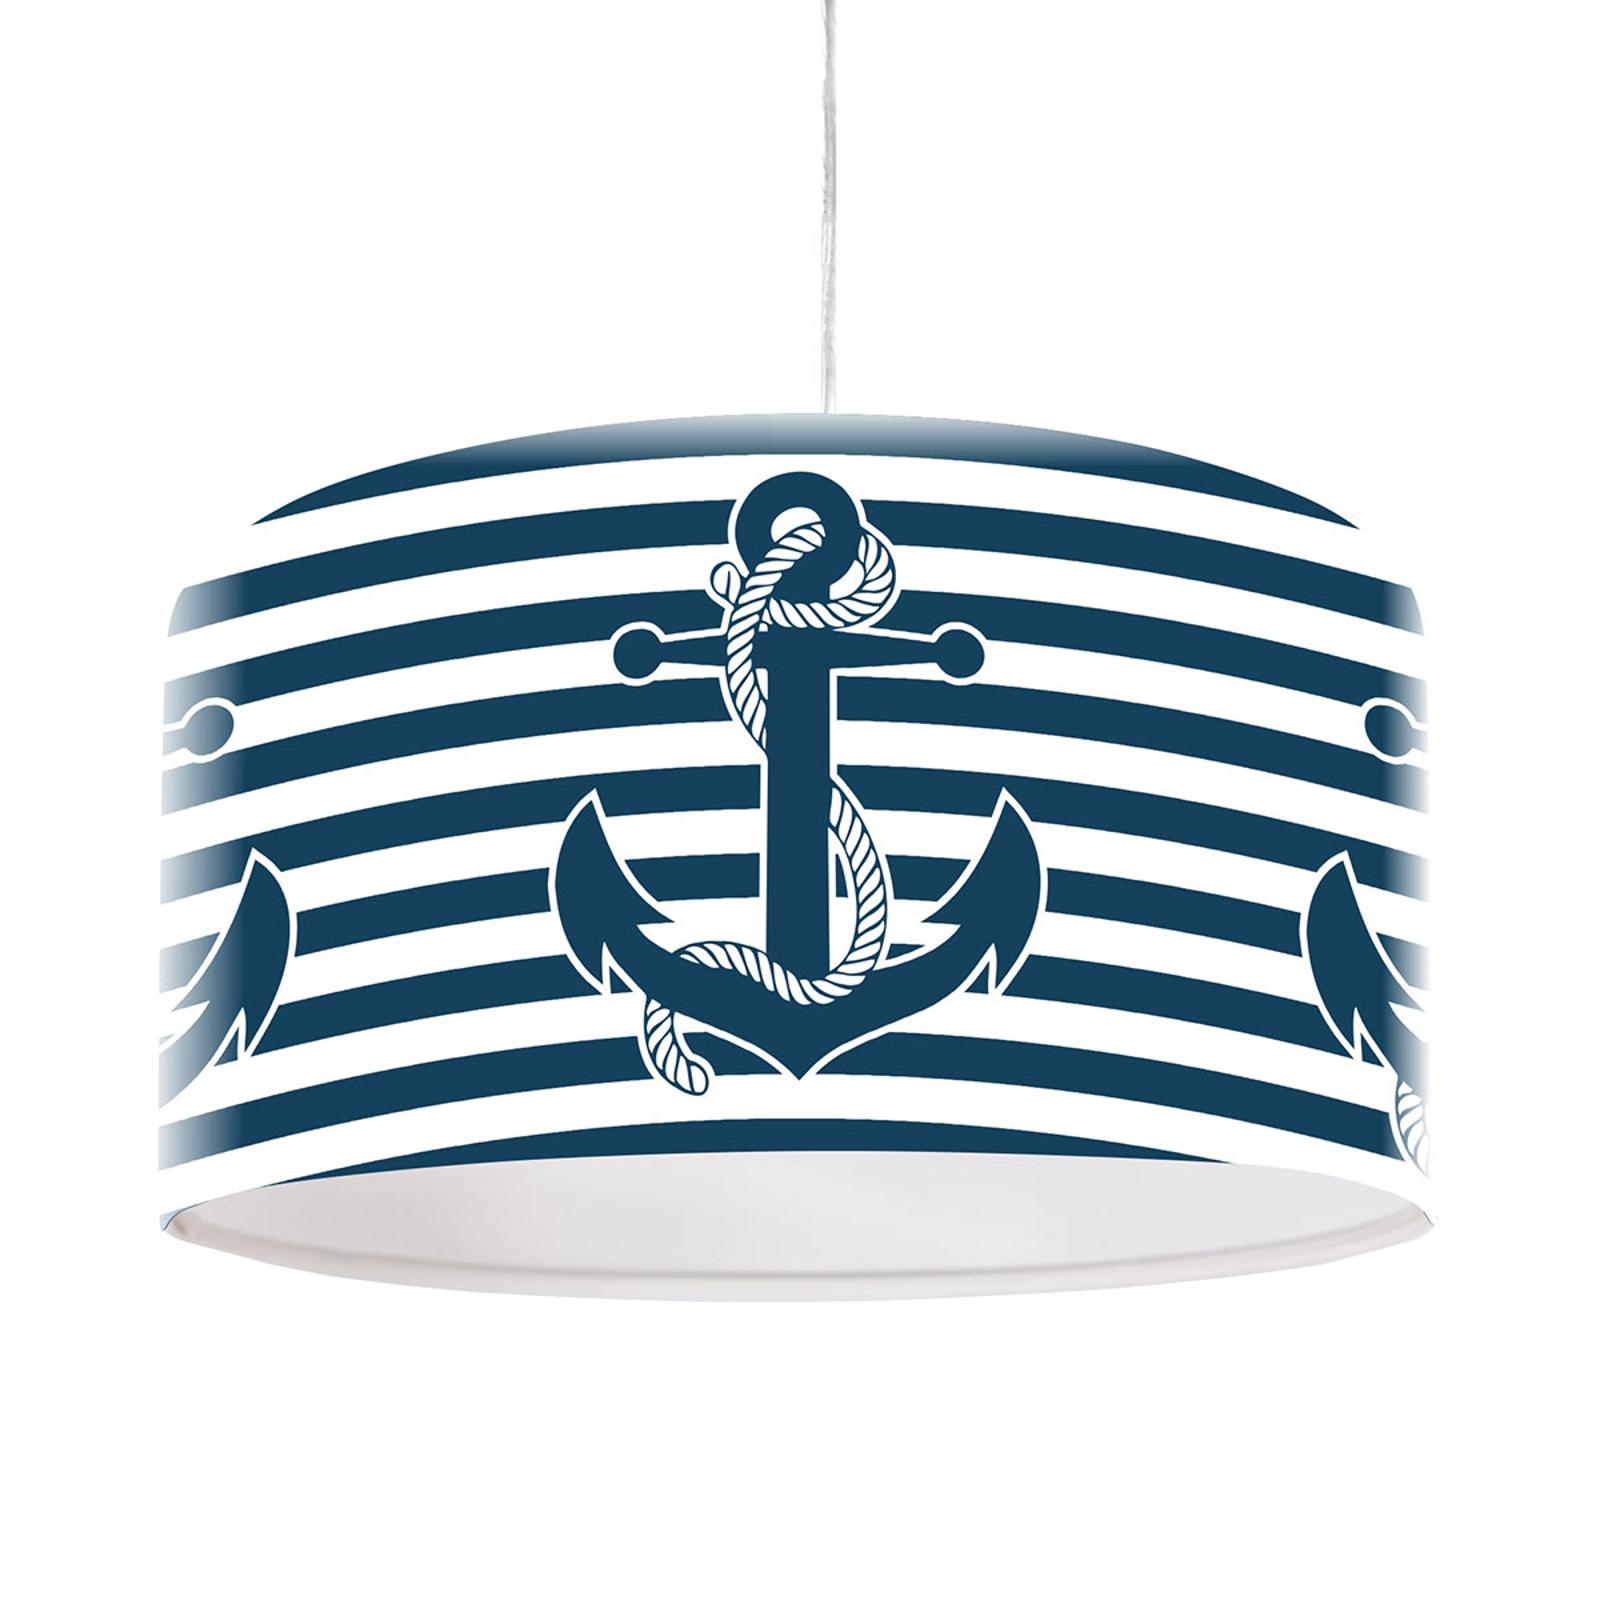 Morska lampa wisząca Ahoi z motywem kotwicy